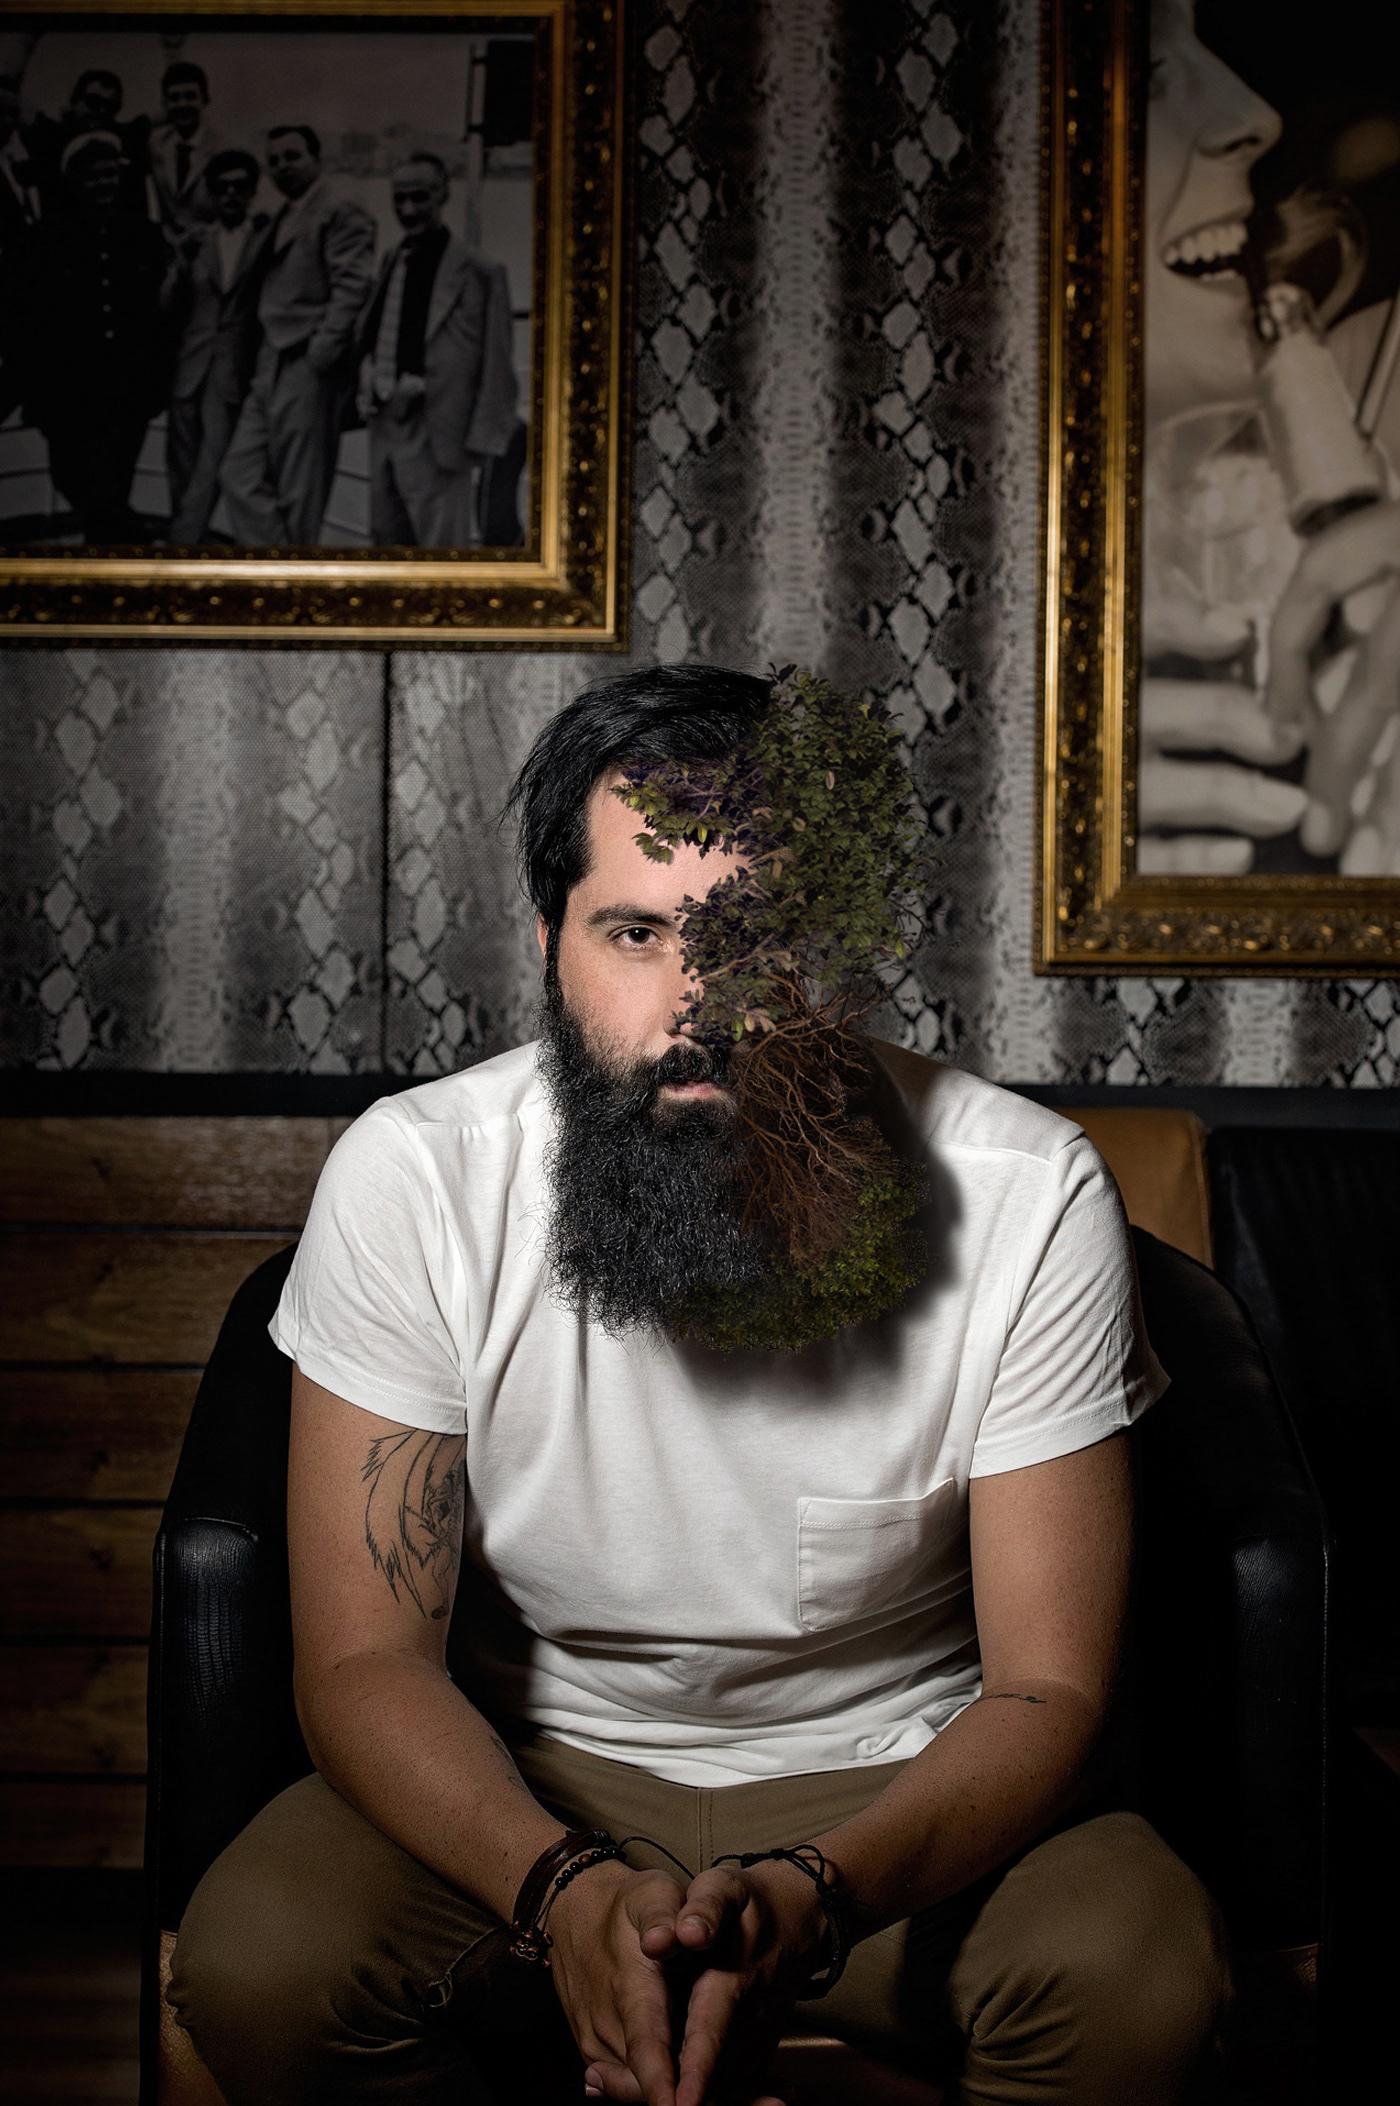 #beardedman #bearded #man #photoshop #adobe #fotografiadigitale #fotografia #direzioneartistica # #photography # #Artisticdirection # #digitalphotography #piante # #plants #cespuglio #bush #behance #moda #